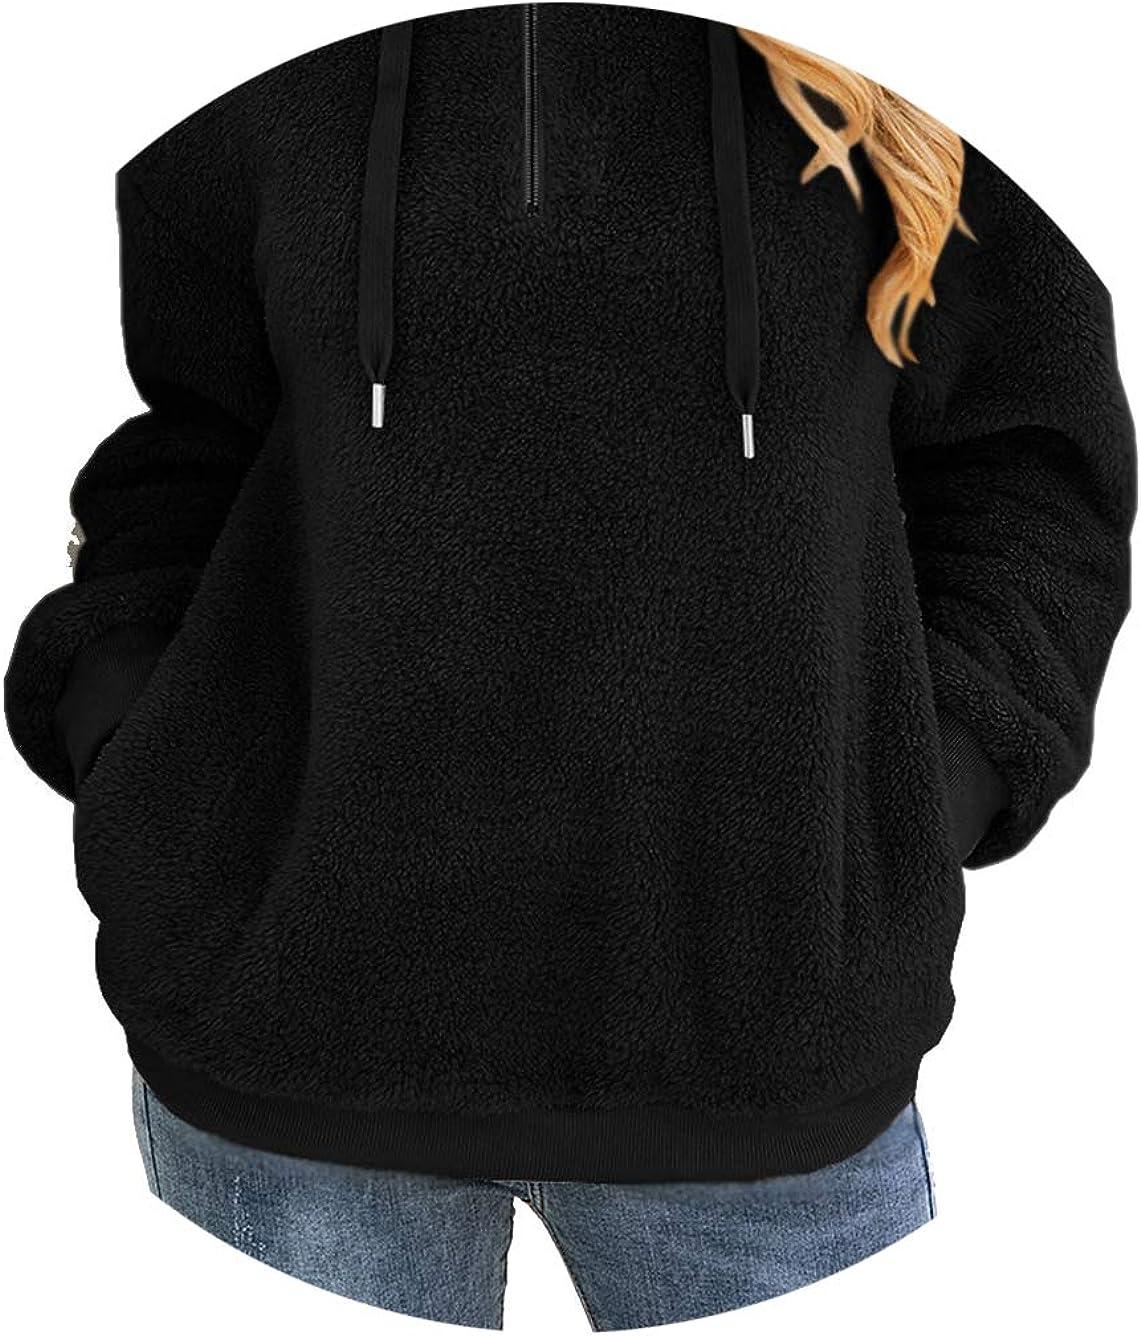 Voopptaw Womens Warm Zip up Fleece Hoodie Fluffy Jumper Sweatshirt with Pockets Black